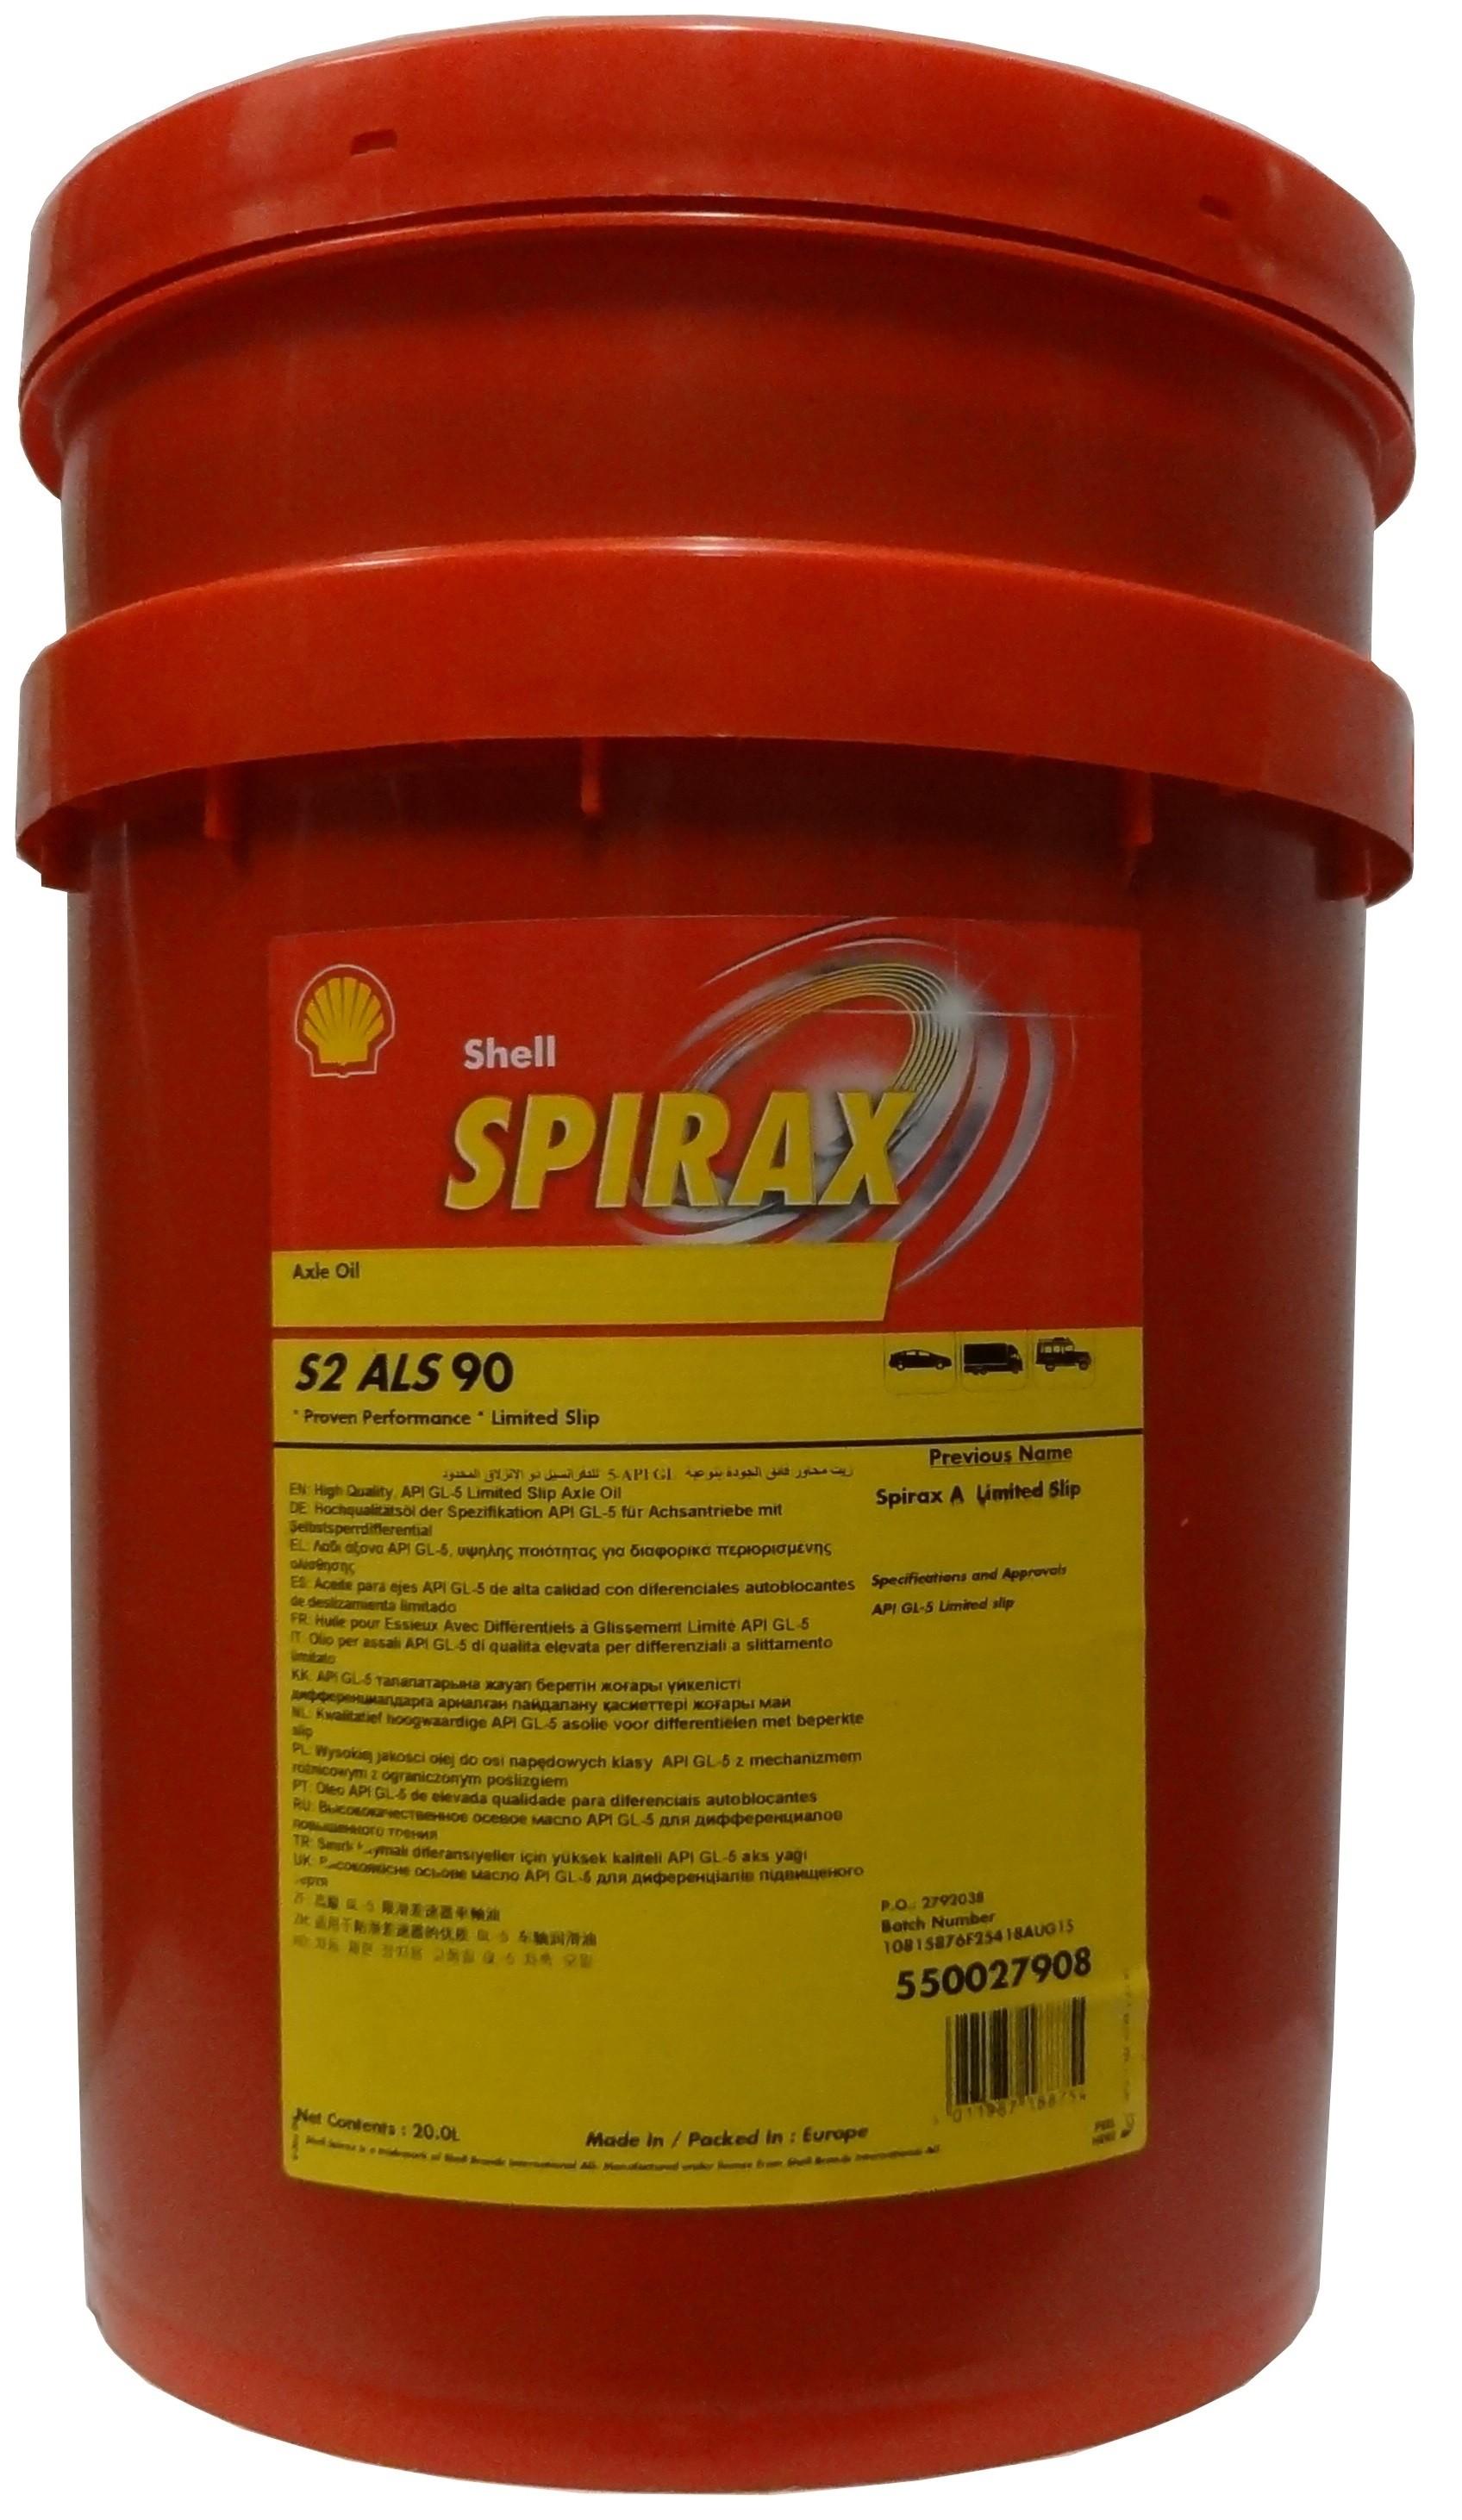 SHELL SPIRAX S2 ALS 90 20L